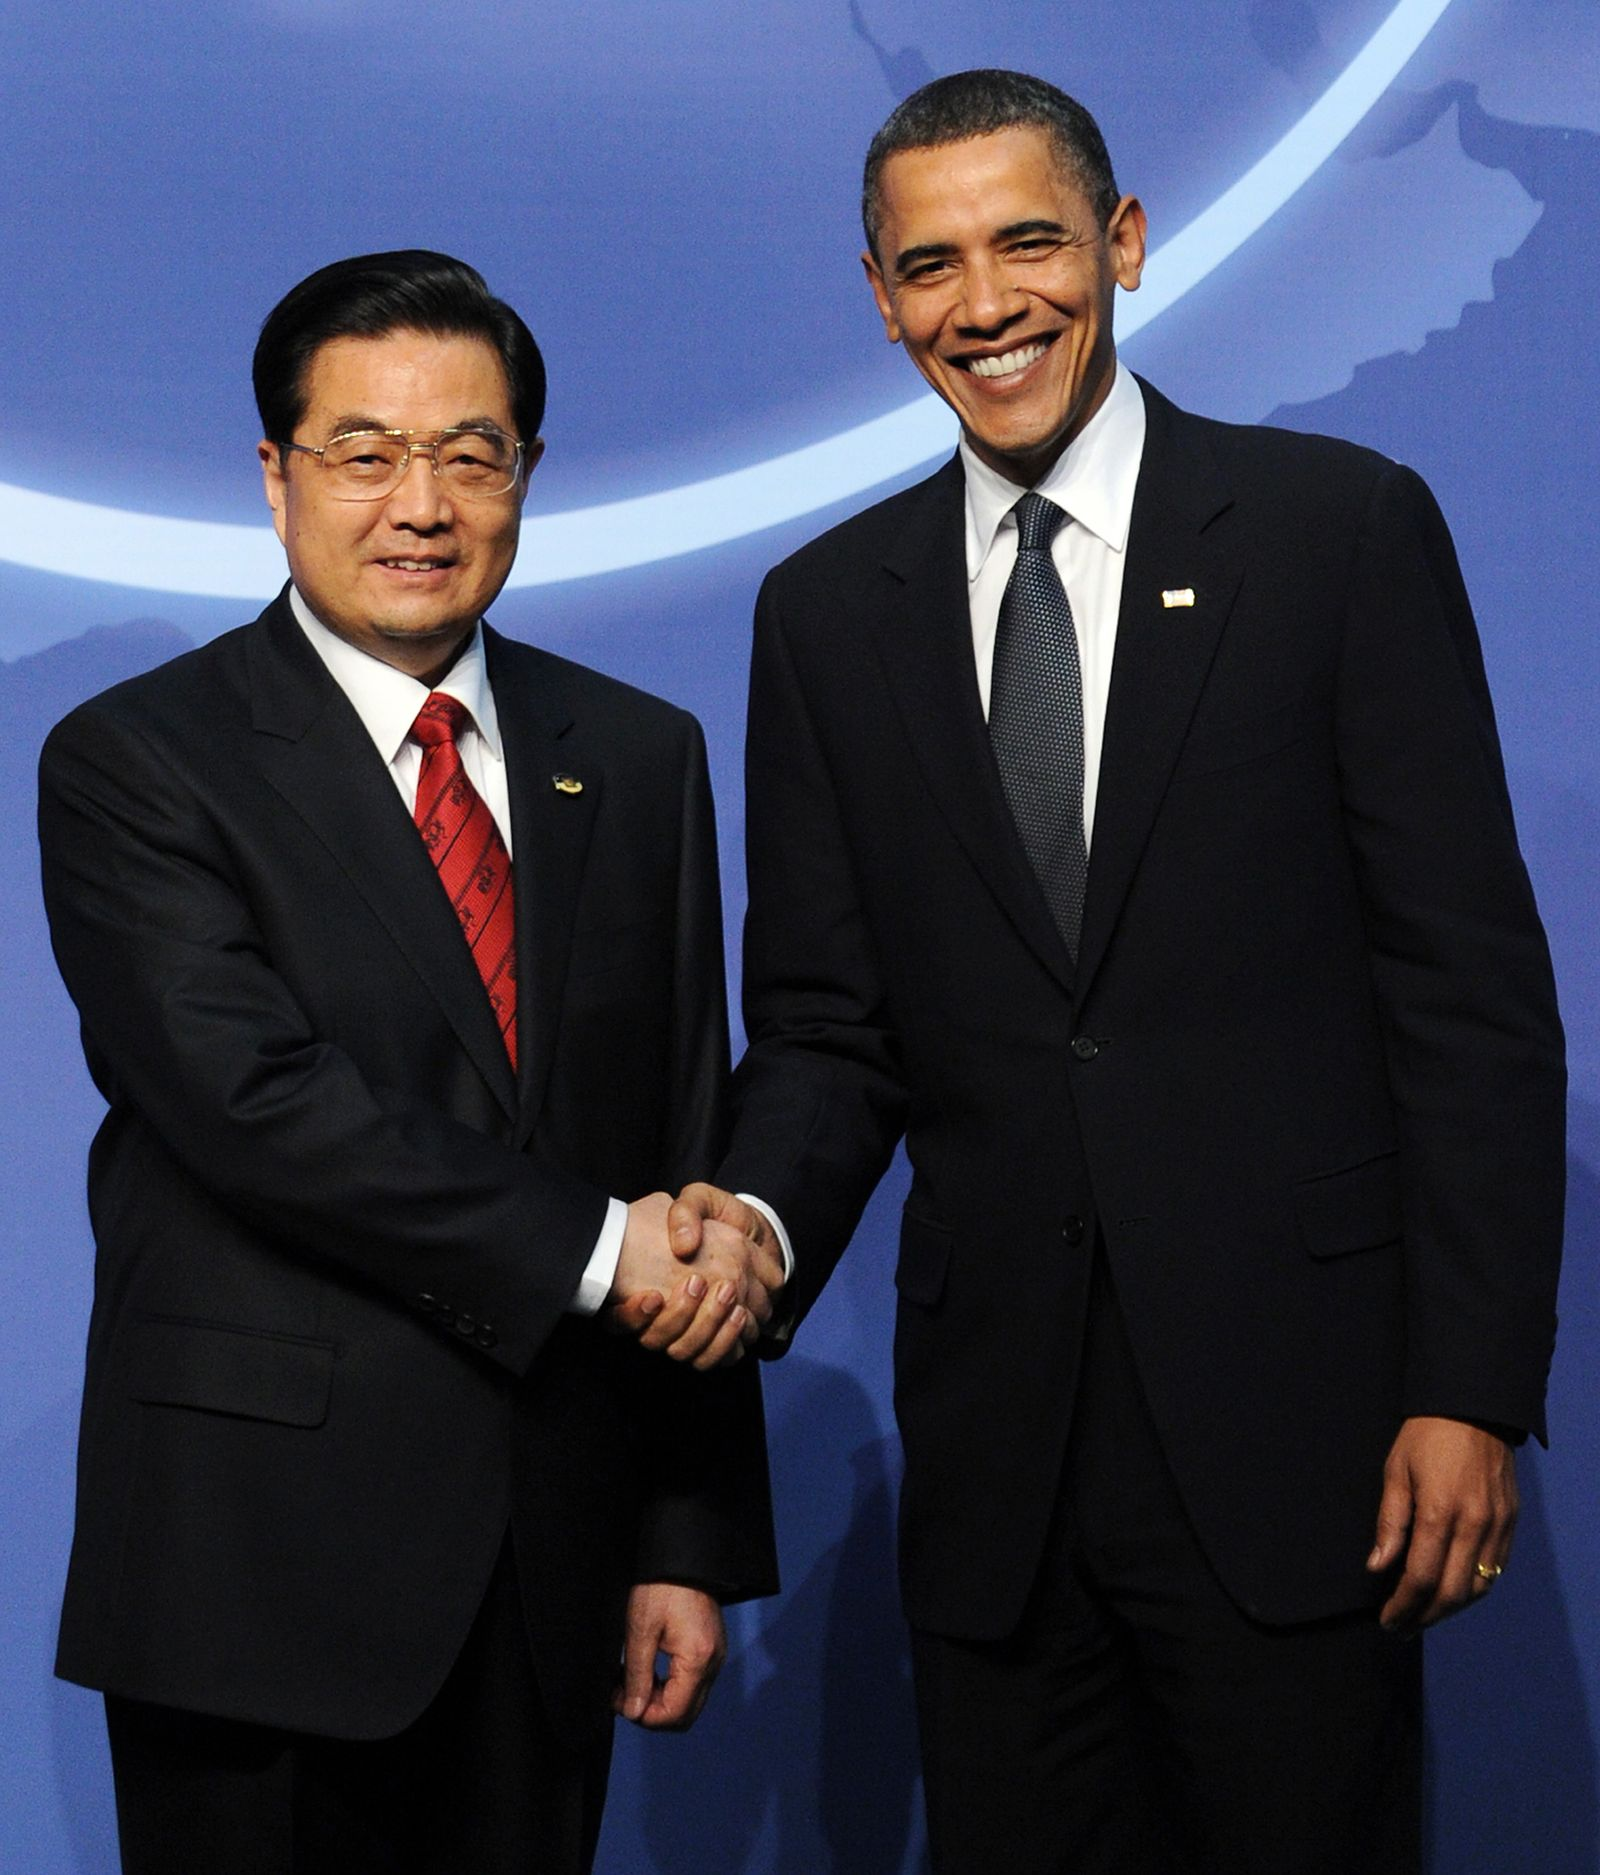 US-NUCLEAR-SUMMIT-CHINA-OBAMA-HU